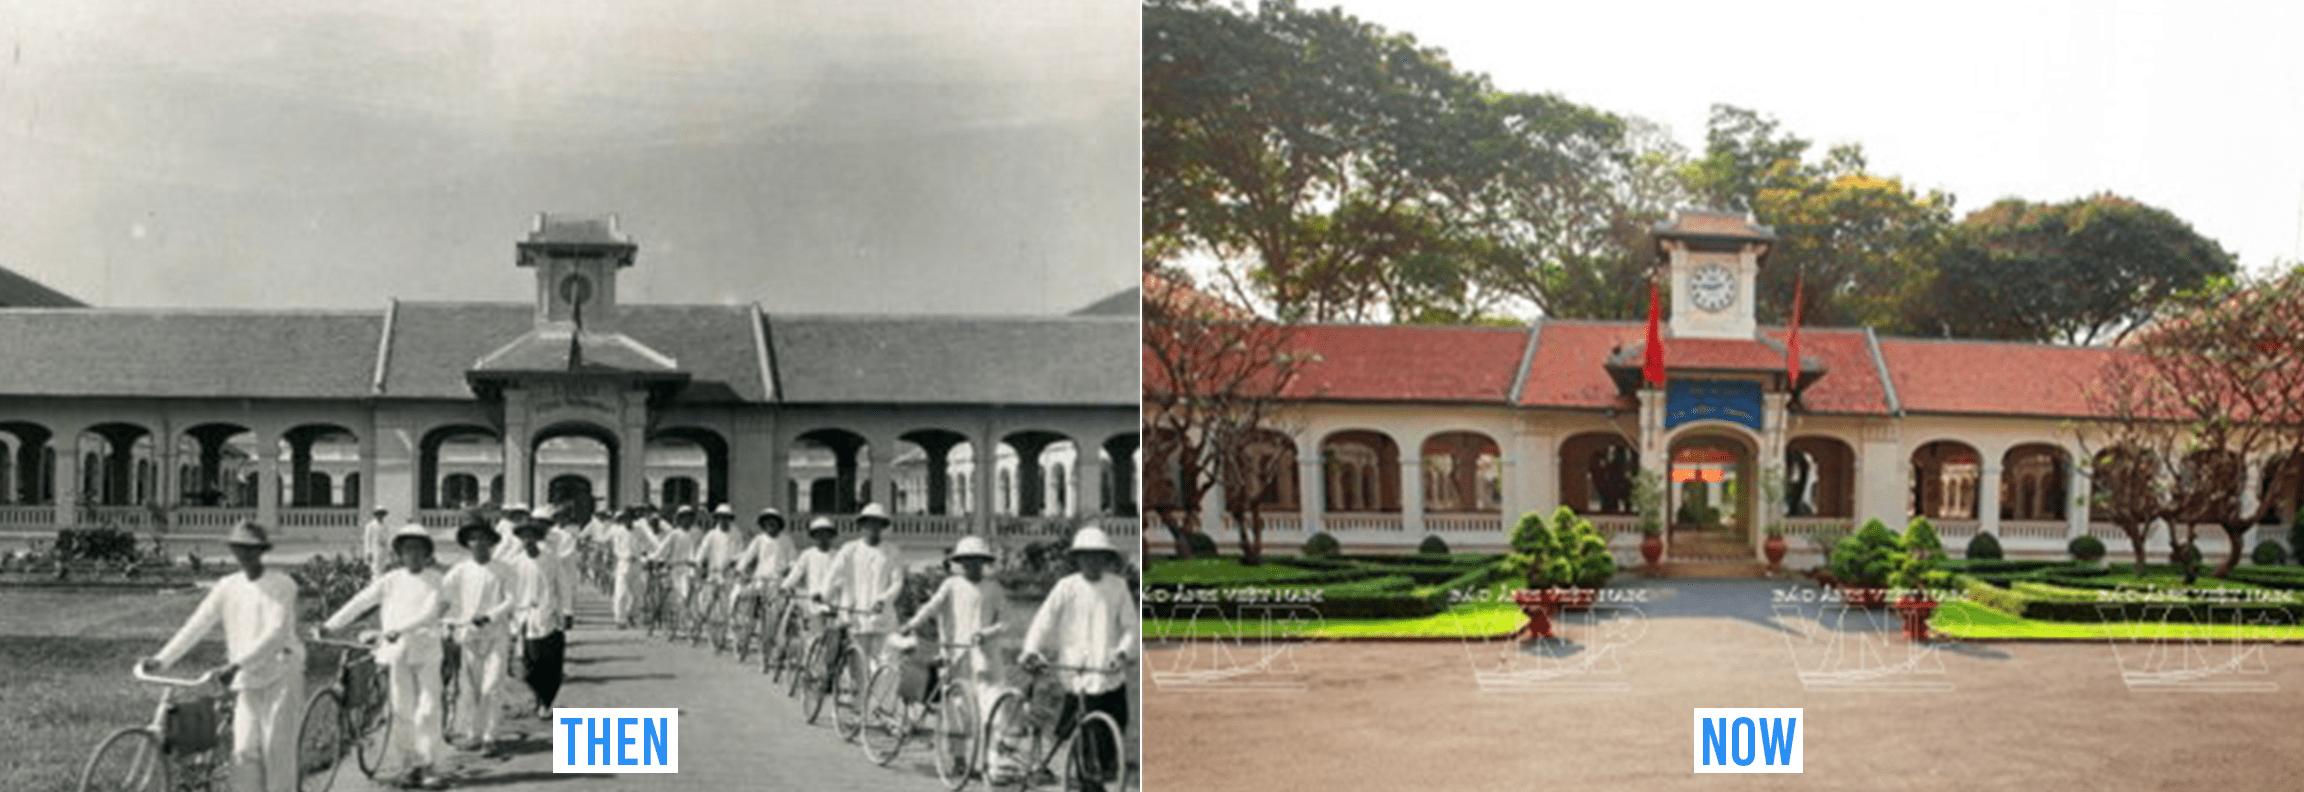 Saigon then and now_petrus ky